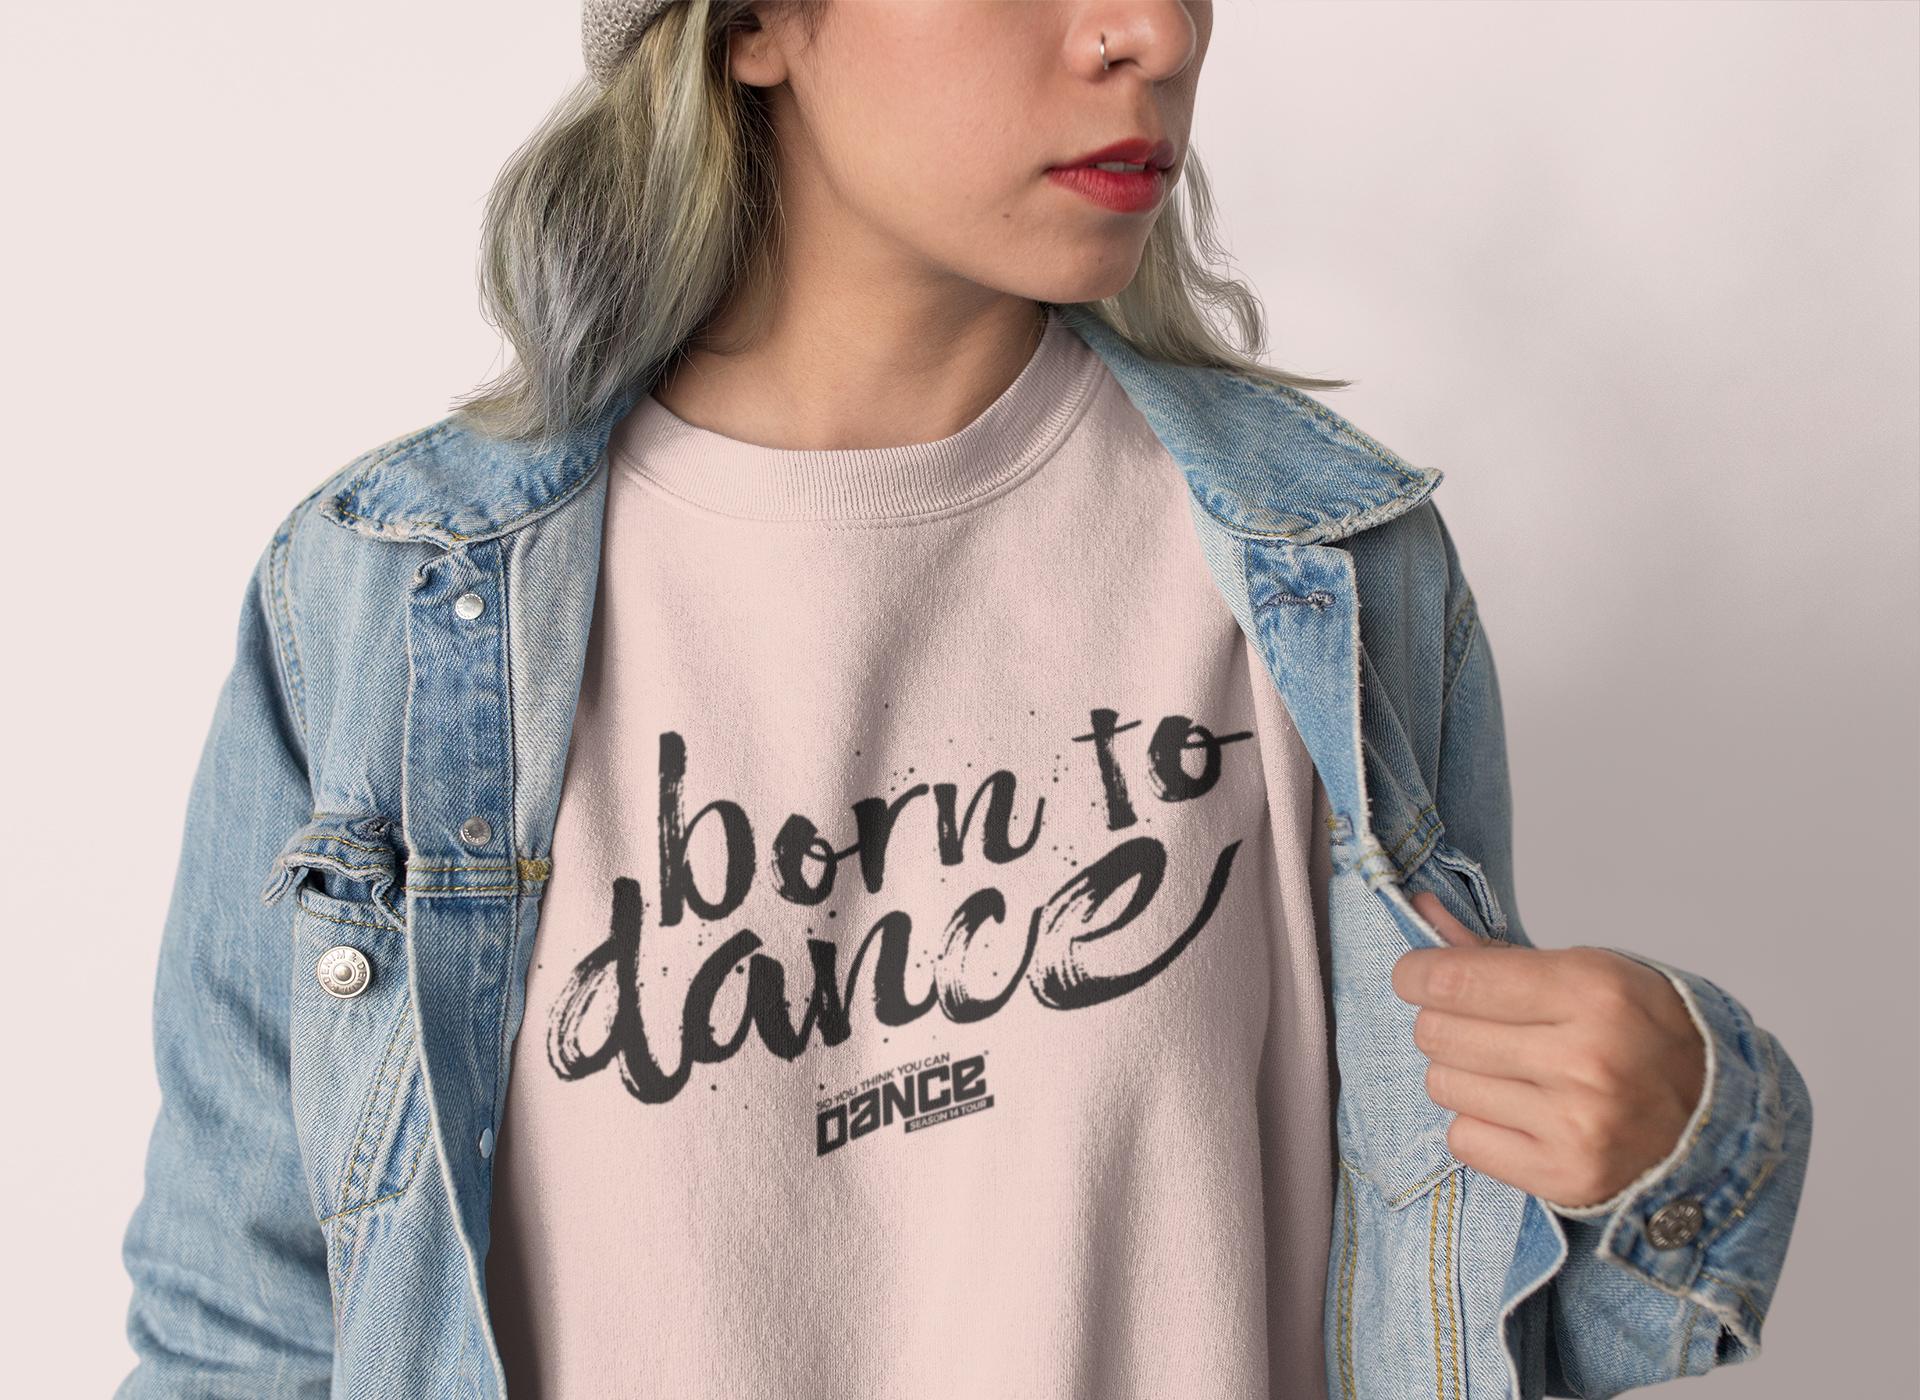 SYTYCD Born To Dance Cropped Sweatshirts